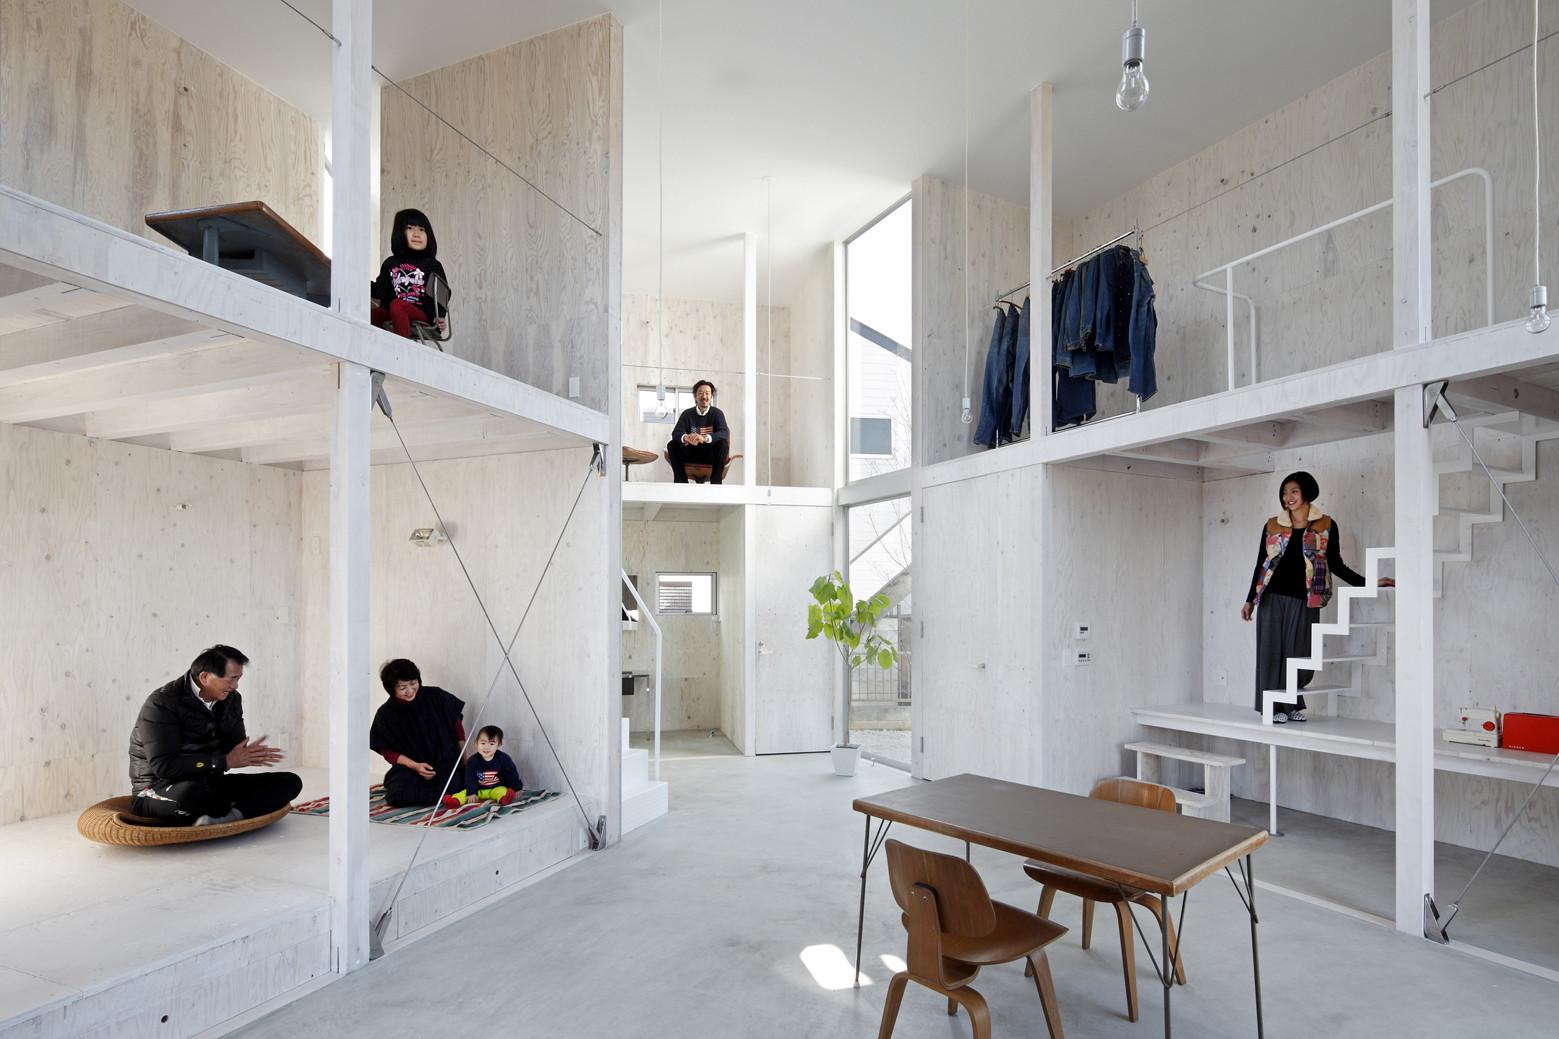 House in kashiwa yamazaki kentaro design workshop for Interior design workshop